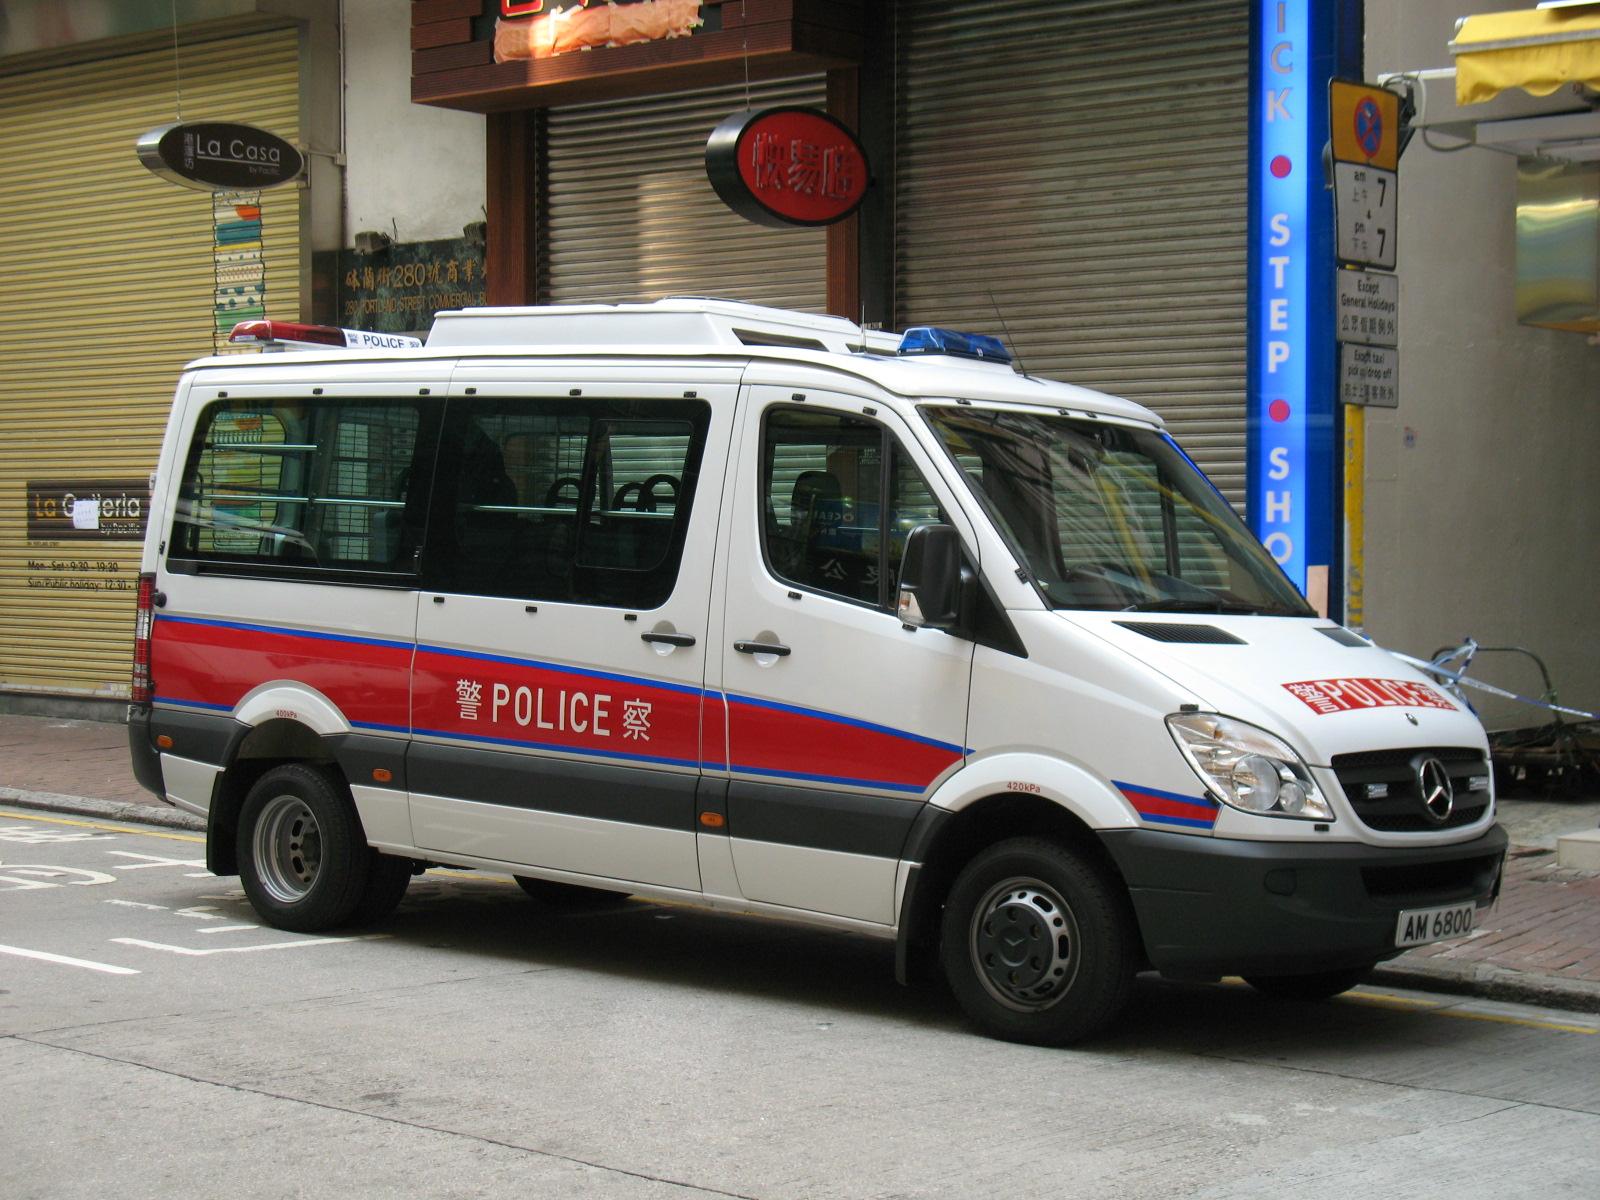 Police vehicles in Hong Kong - Wikiwand